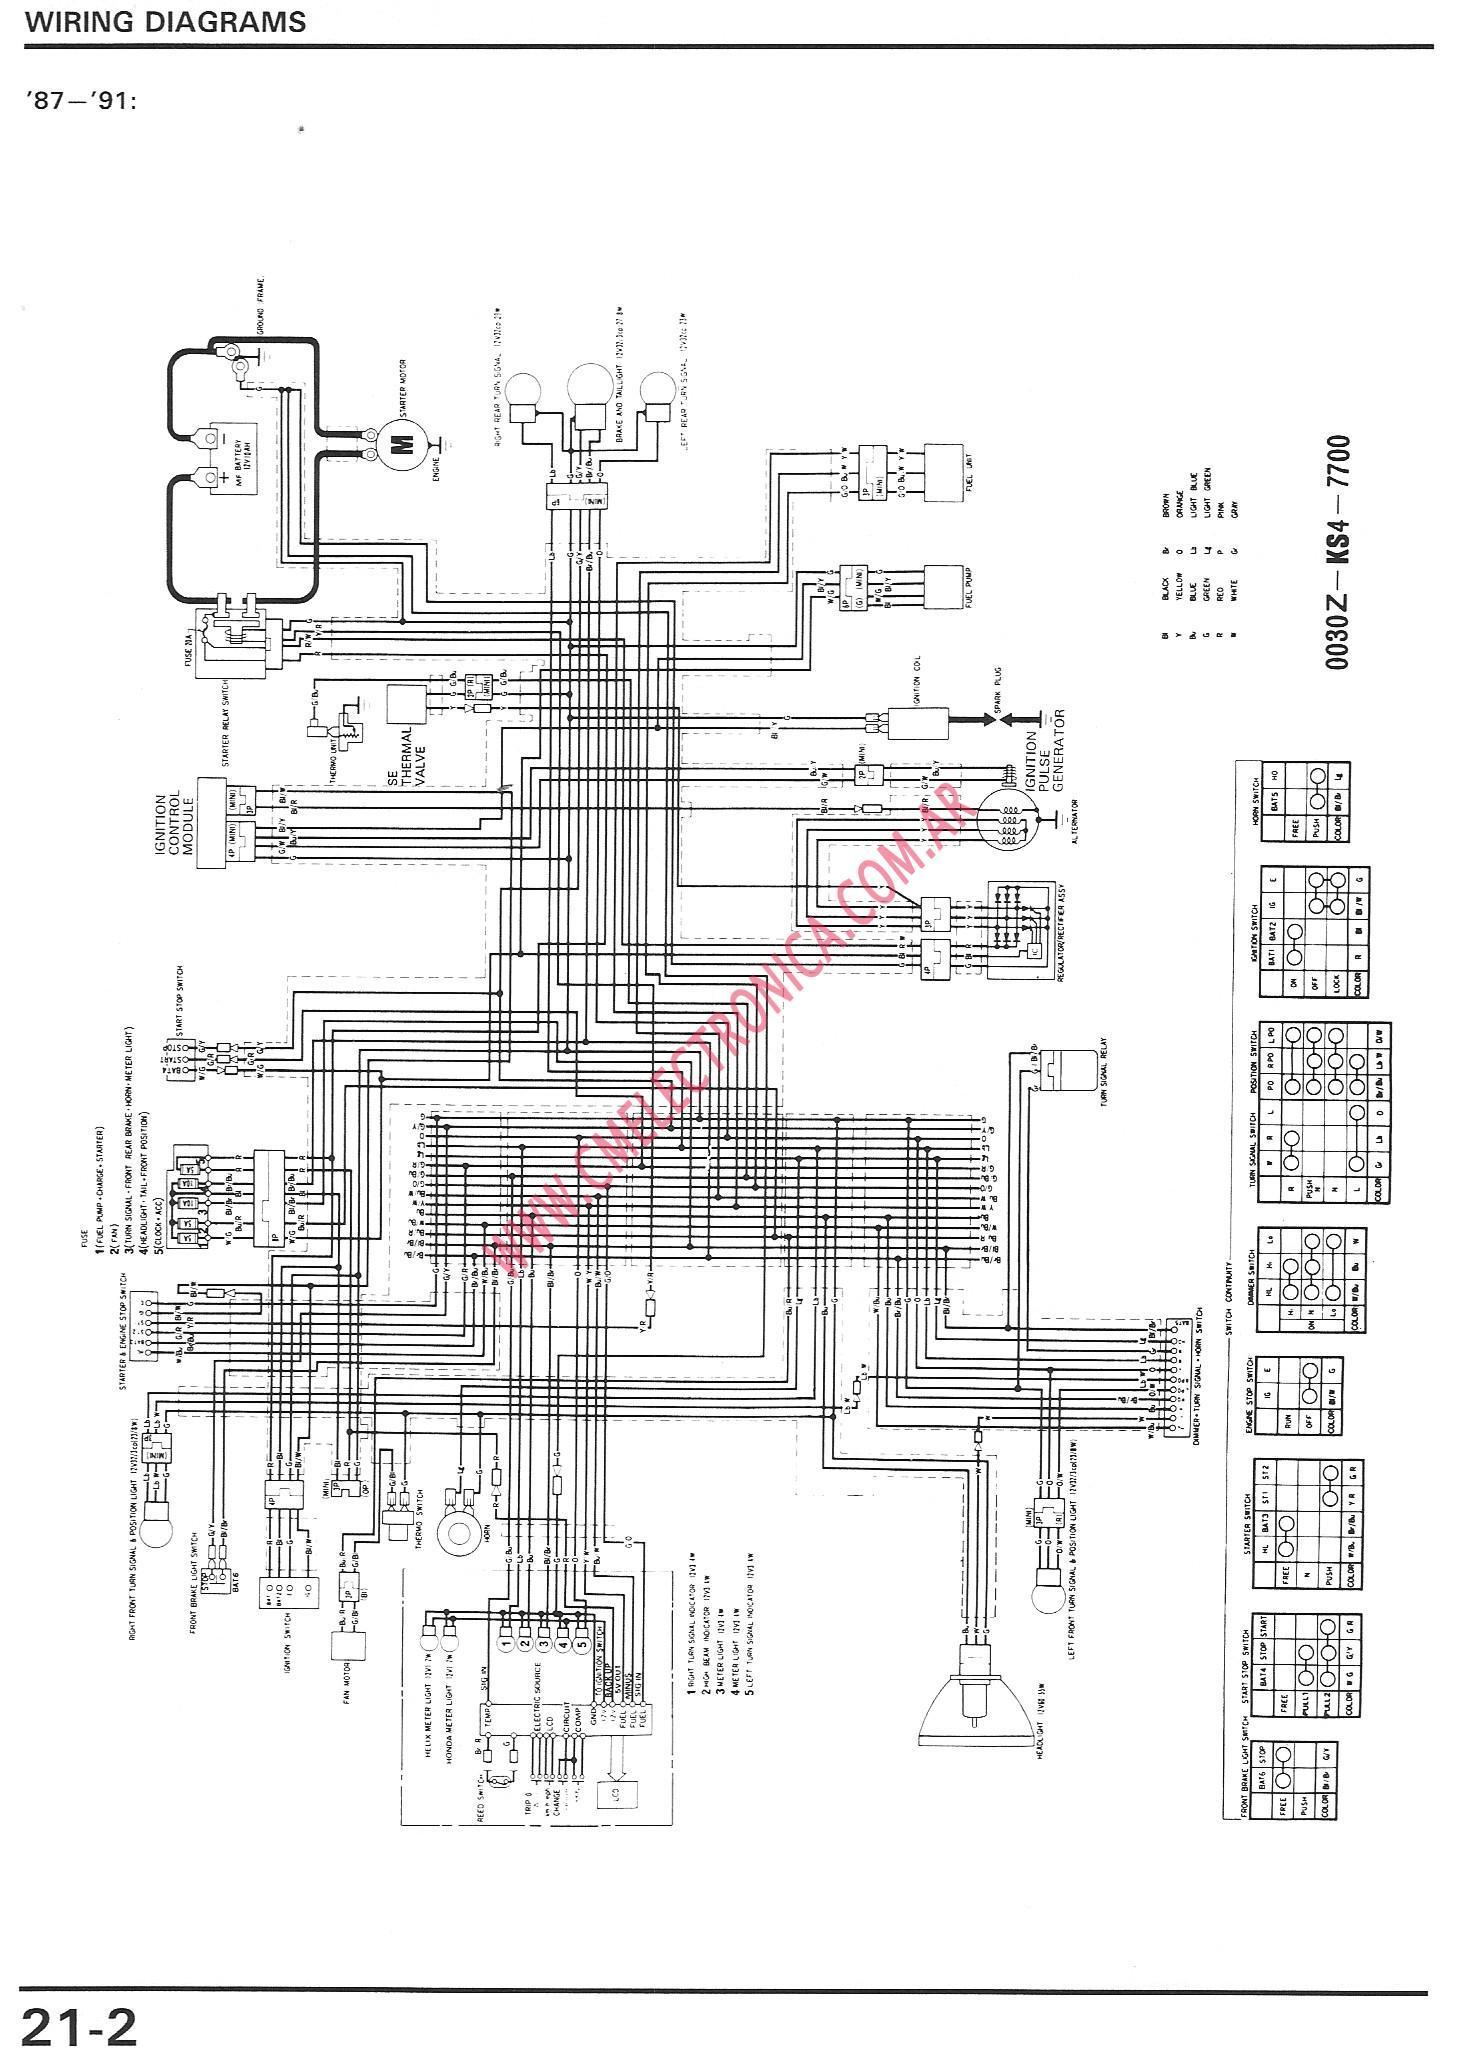 Mini Truck Wiring Diagram : Wiring Diagram For Suzuki Mini